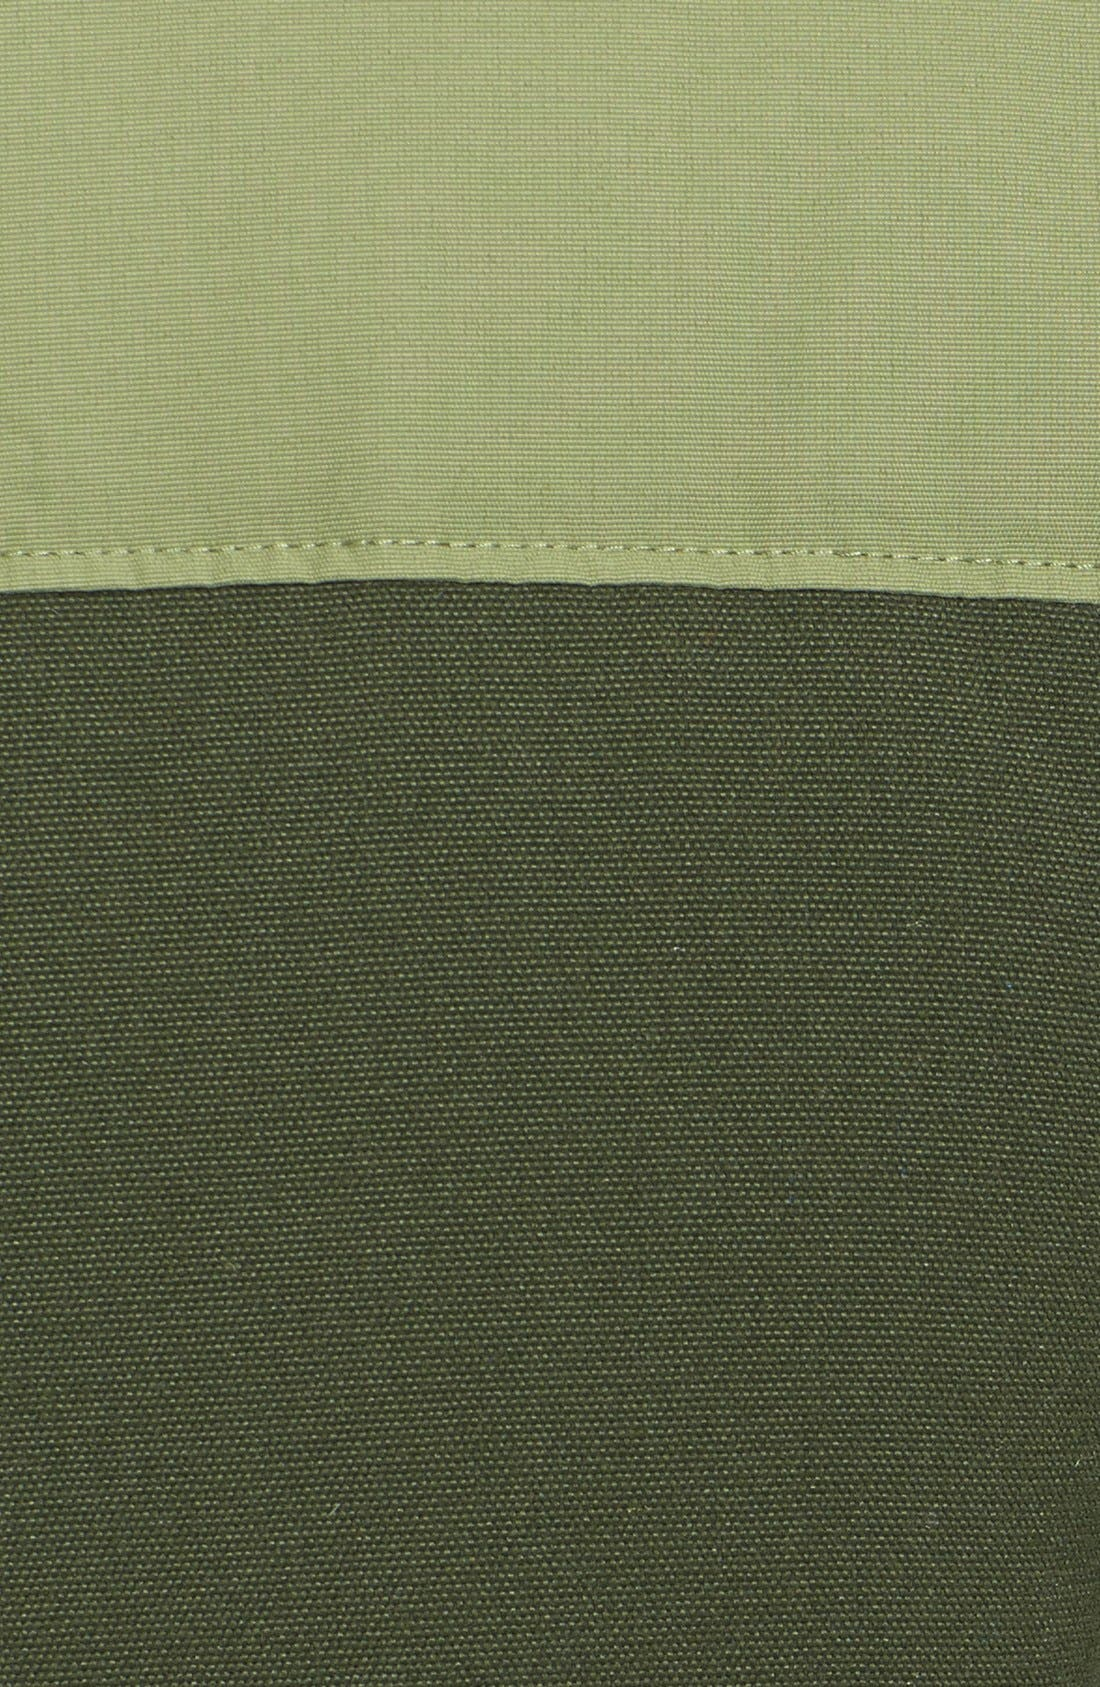 Alternate Image 3  - Patagonia 'Bivy' Quilted Down Jacket